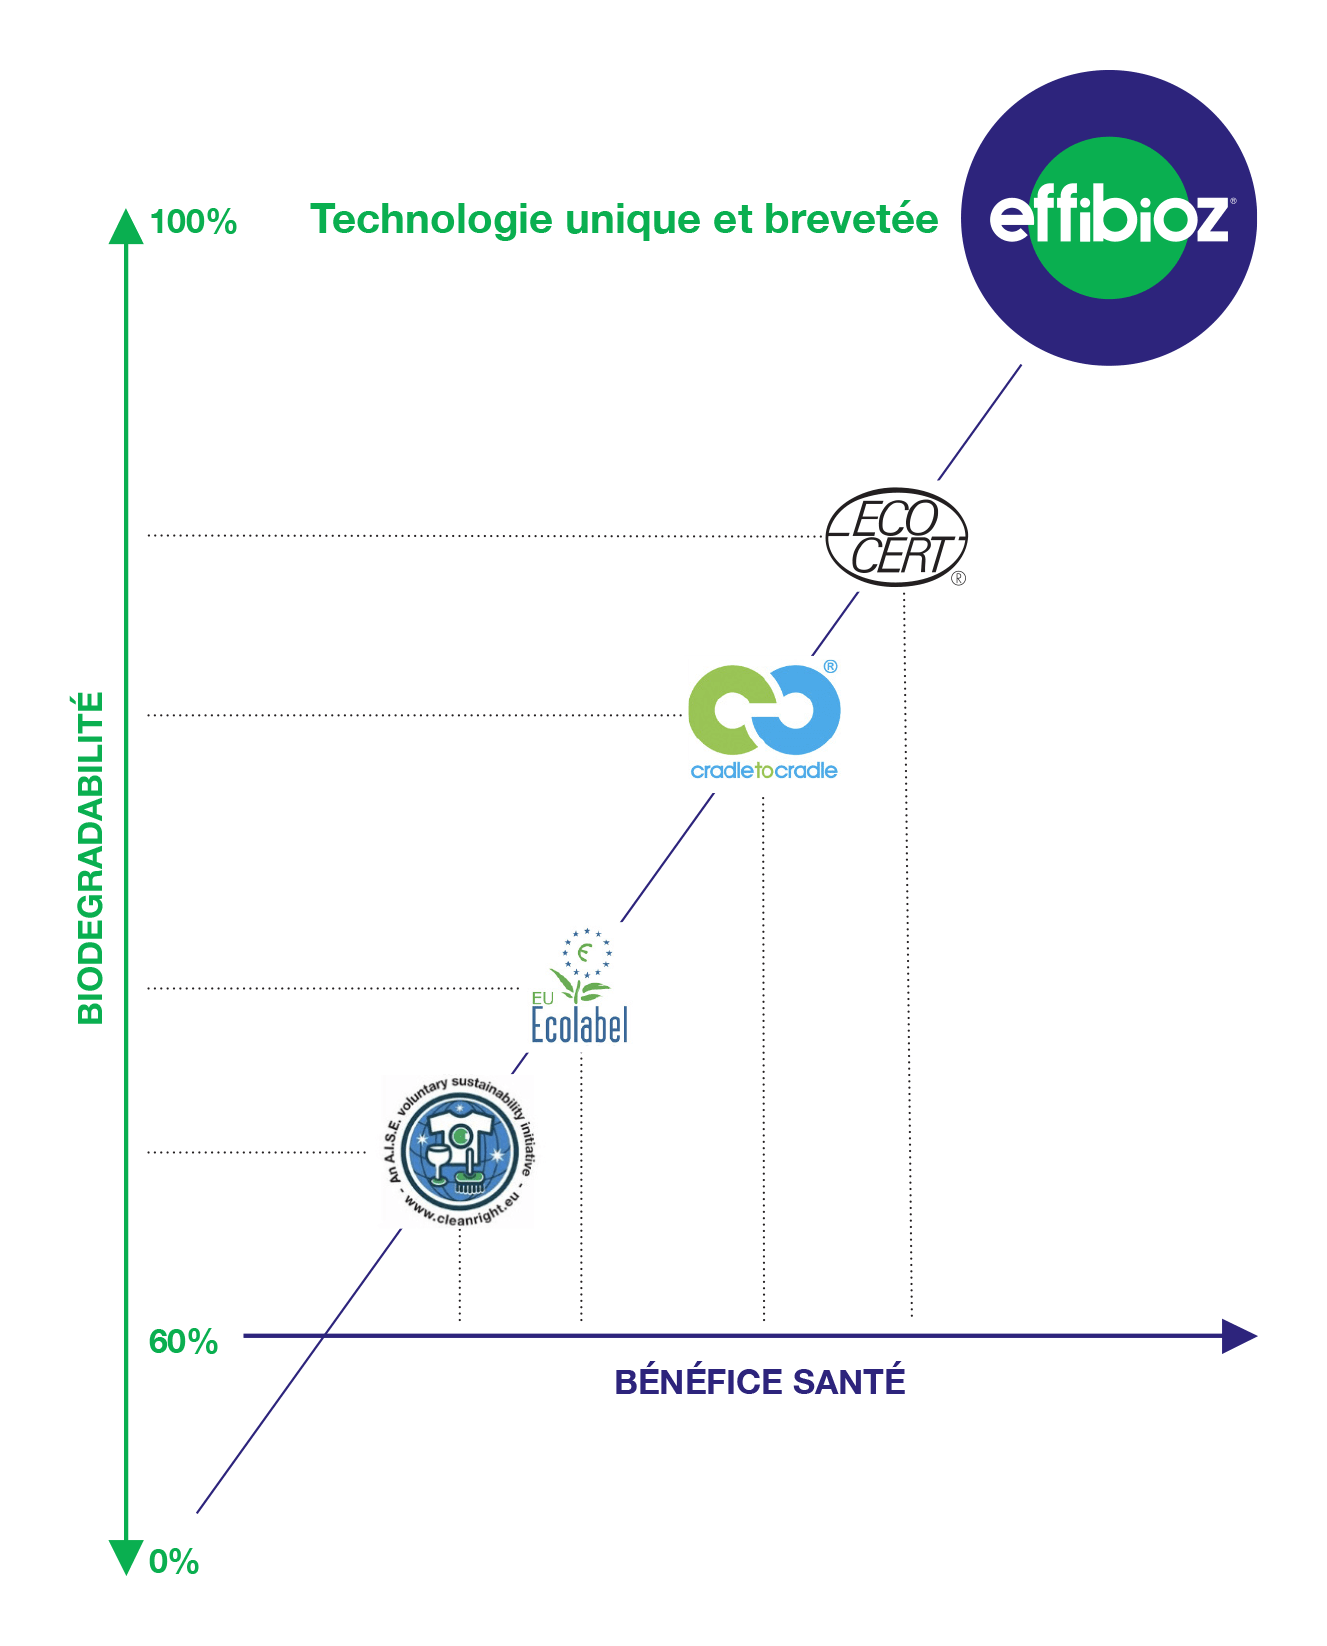 Effibioz Label Biodegradabilite benefice sante